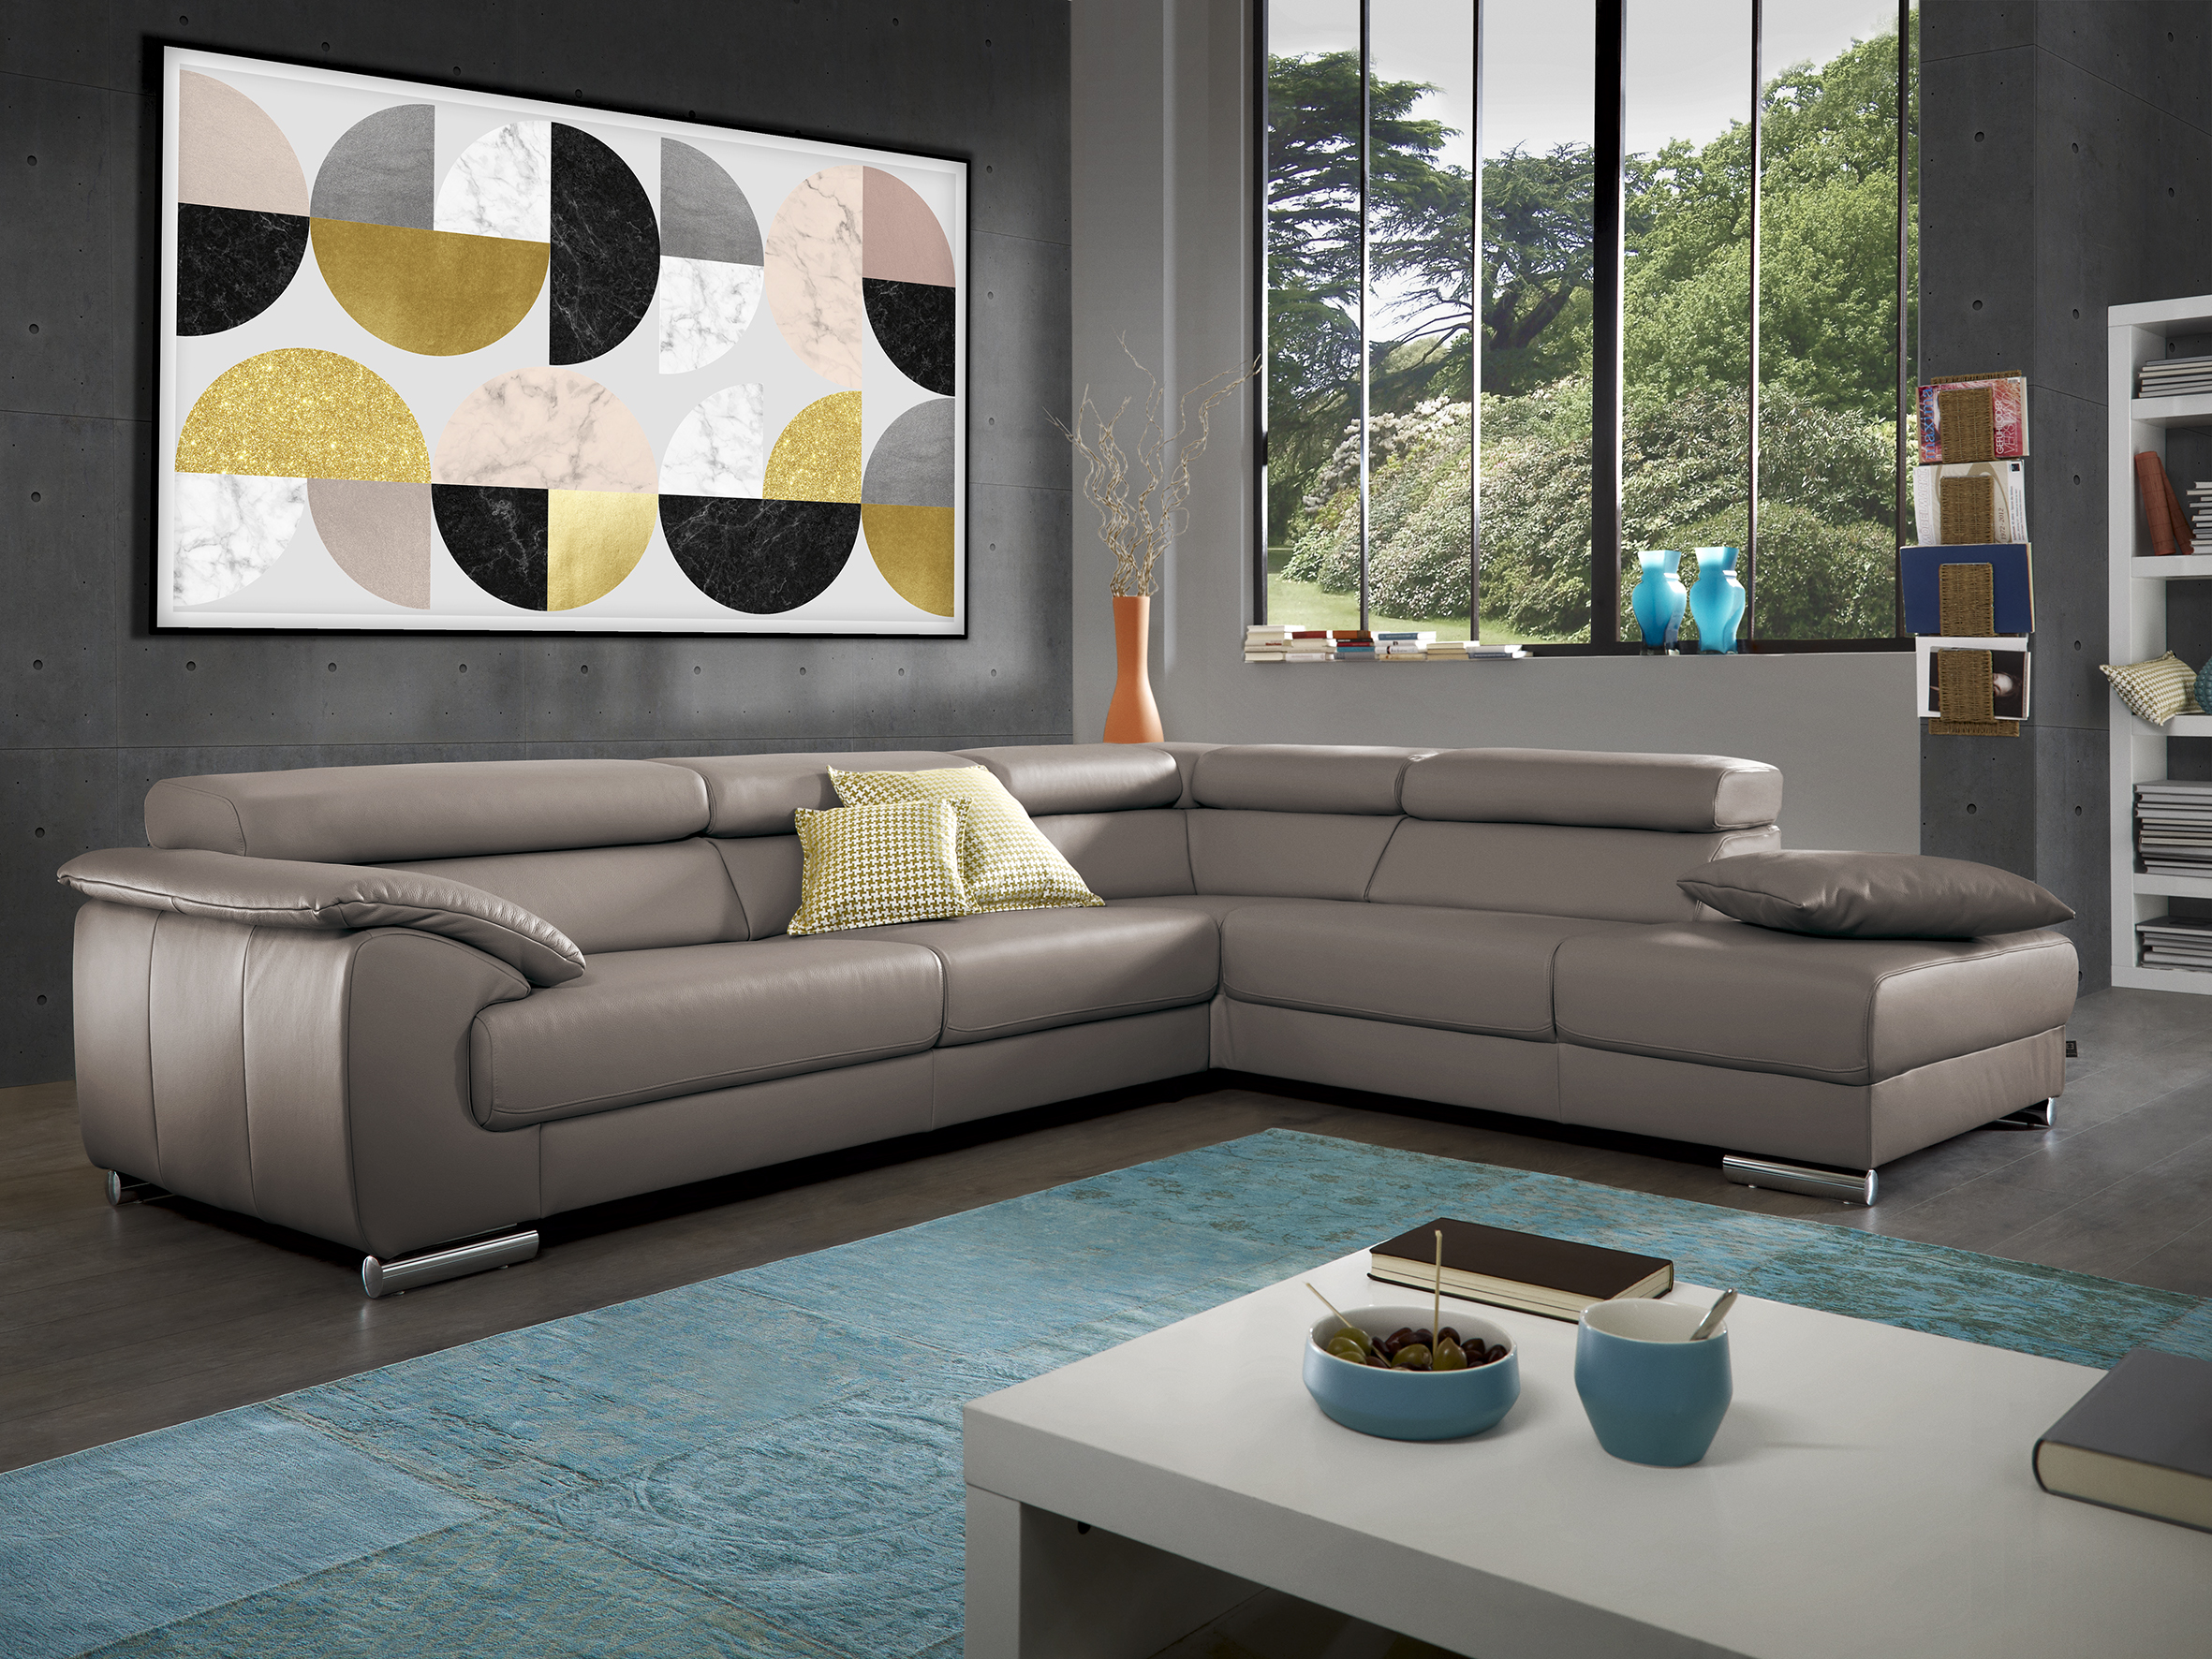 polsterecke blues von ewald schillig brand flamme. Black Bedroom Furniture Sets. Home Design Ideas